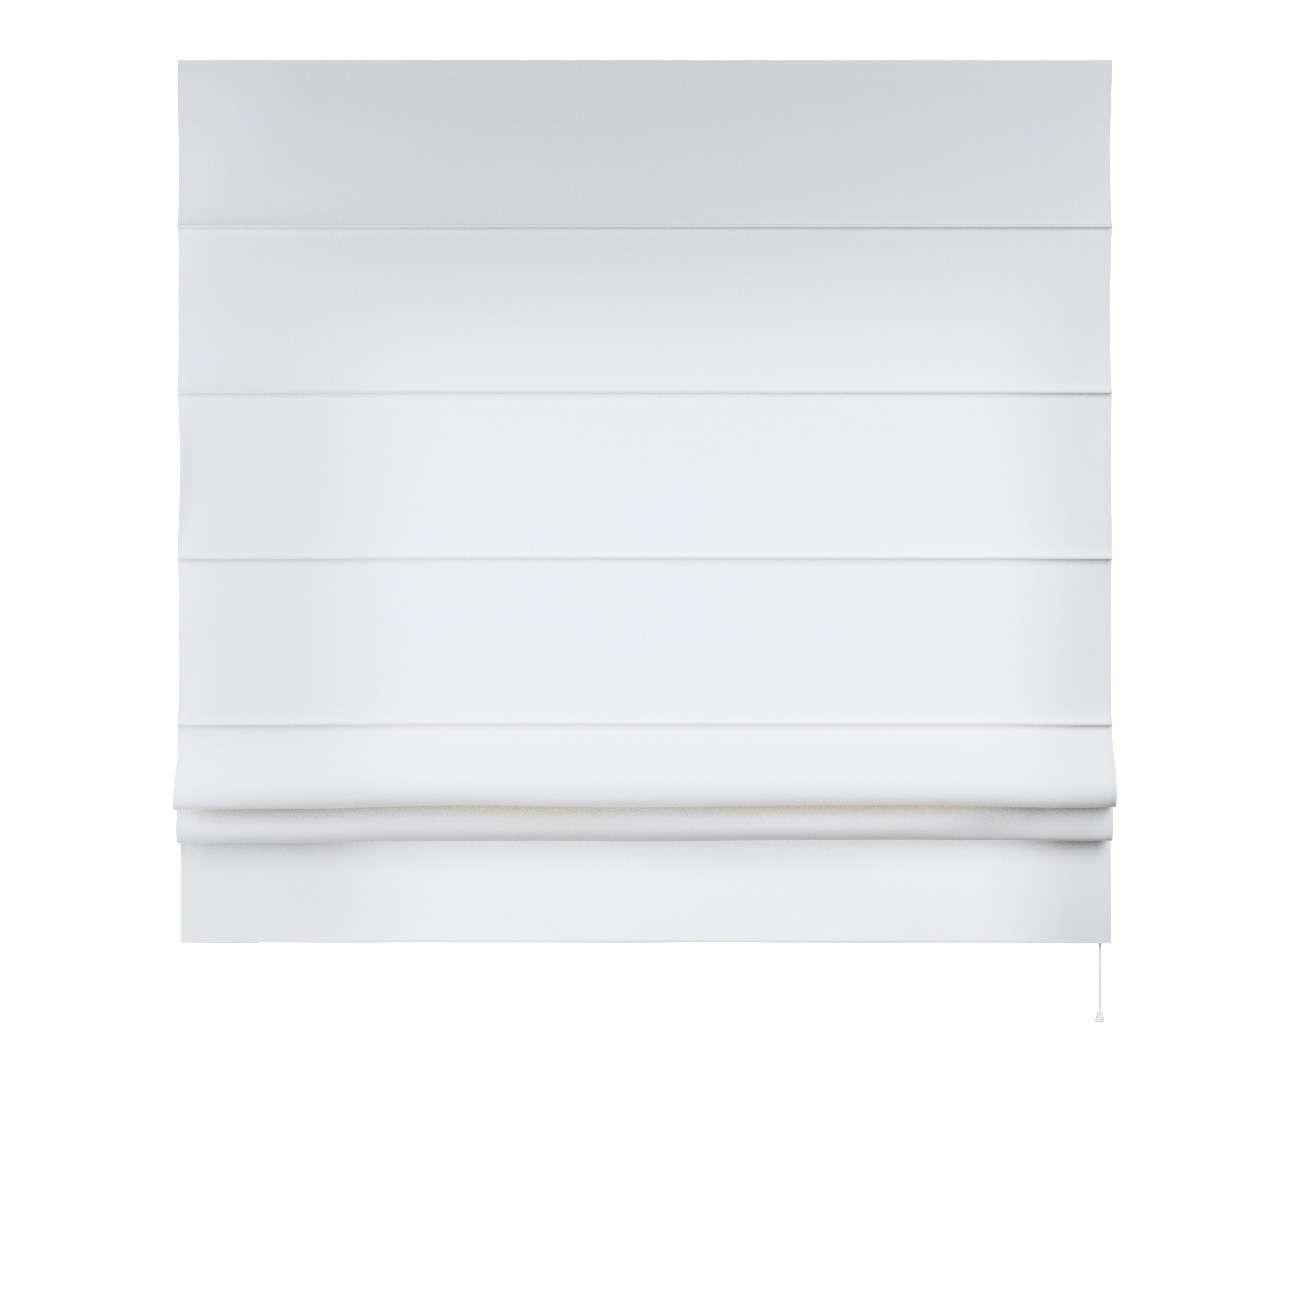 Raffrollo Padva 80 x 170 cm von der Kollektion Loneta, Stoff: 133-02